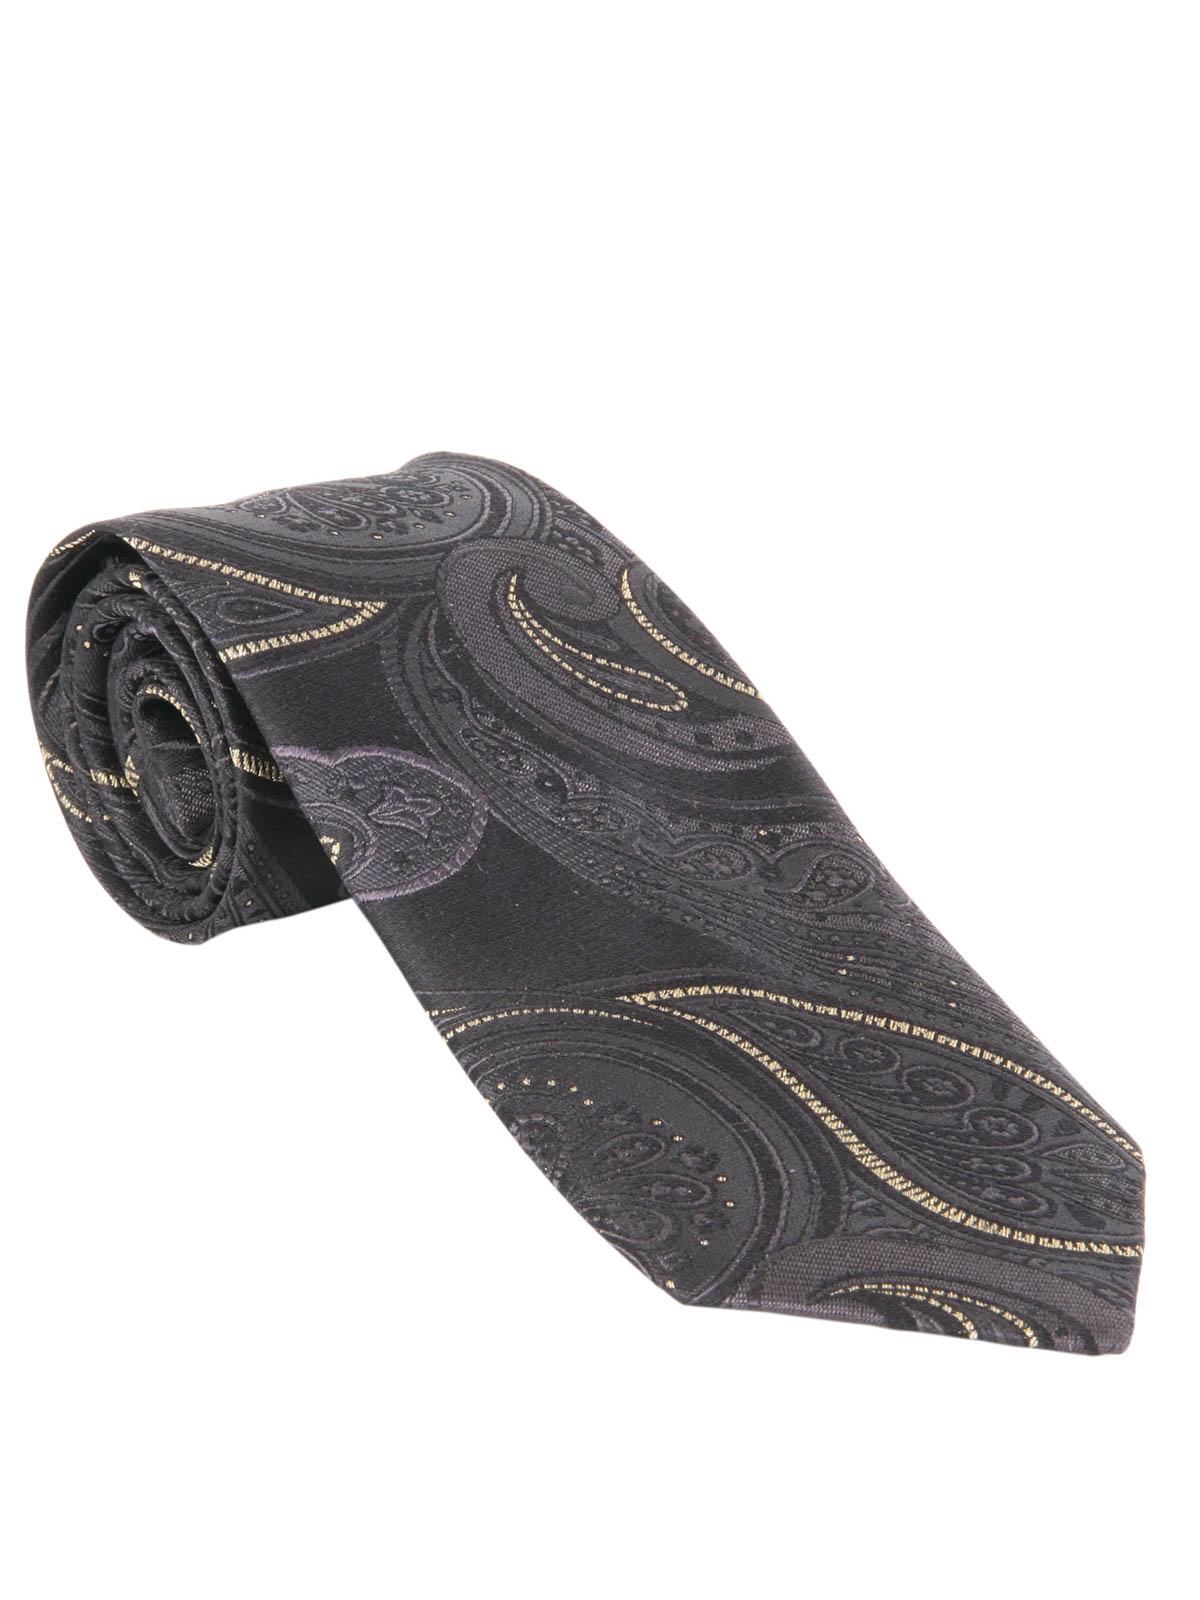 low priced 51296 33dd3 Etro - Cravatta in seta - cravatte e papillion - 12026 1 ...